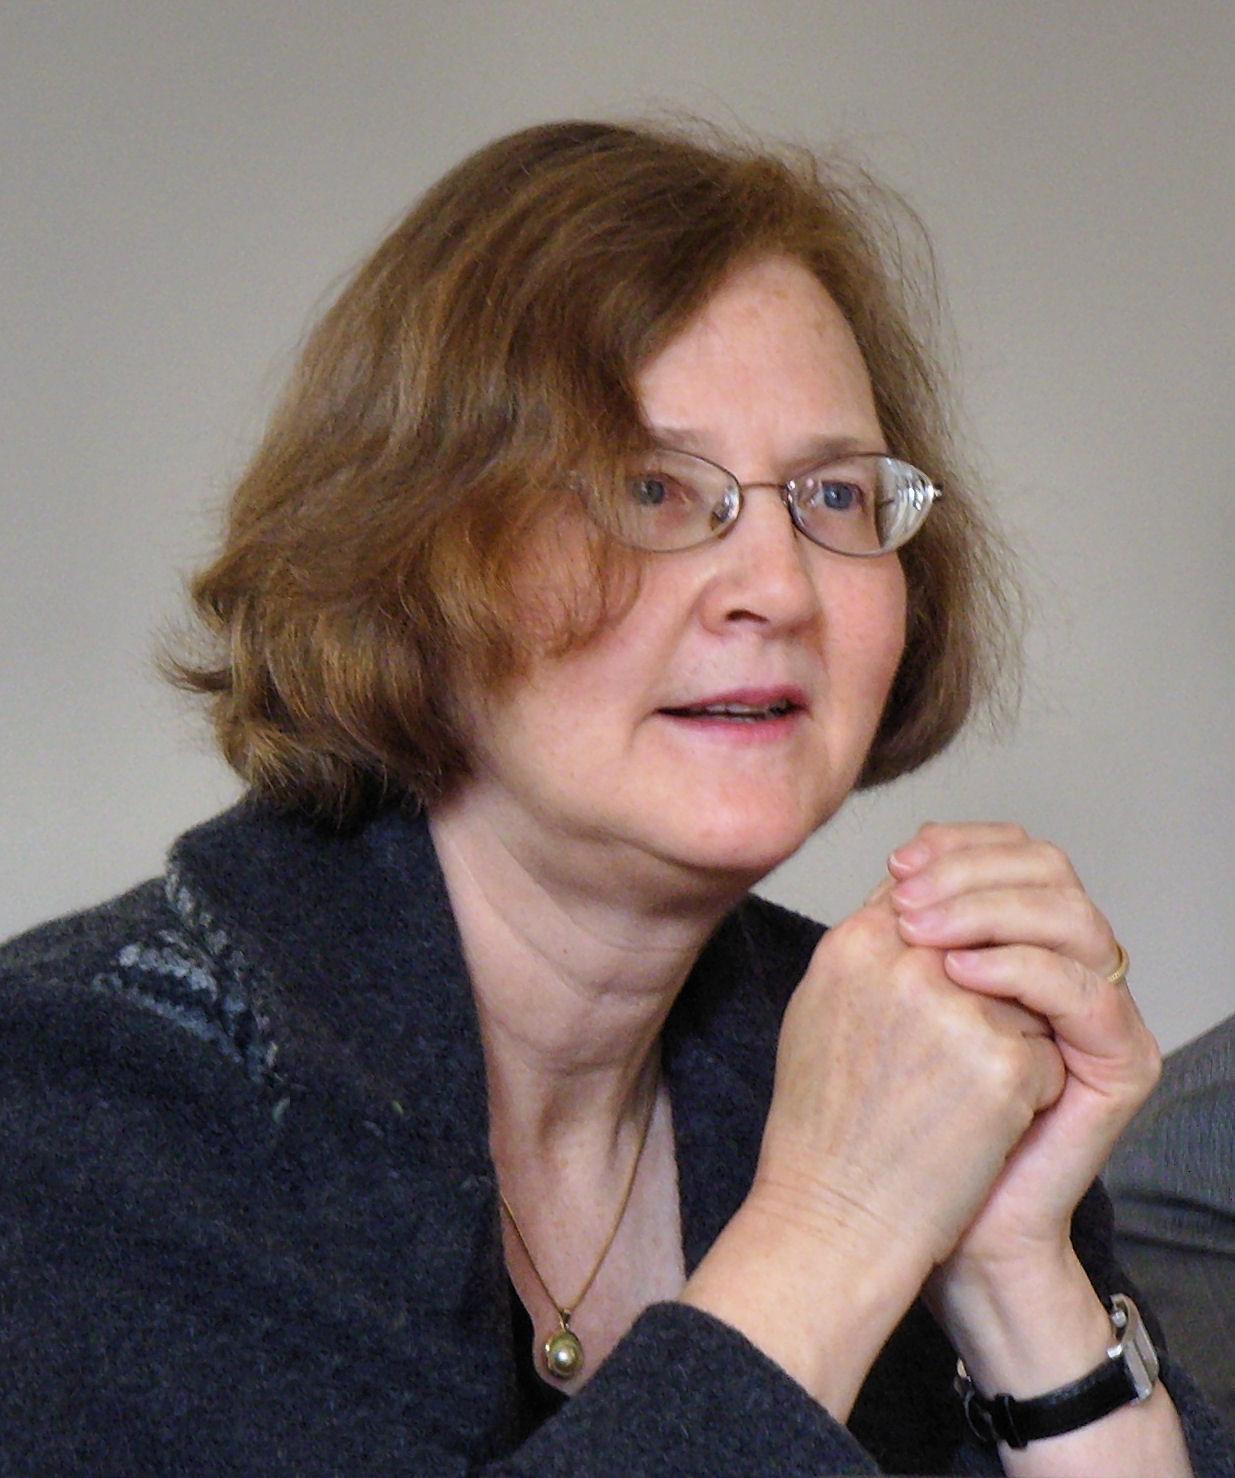 image of Elizabeth Blackburn